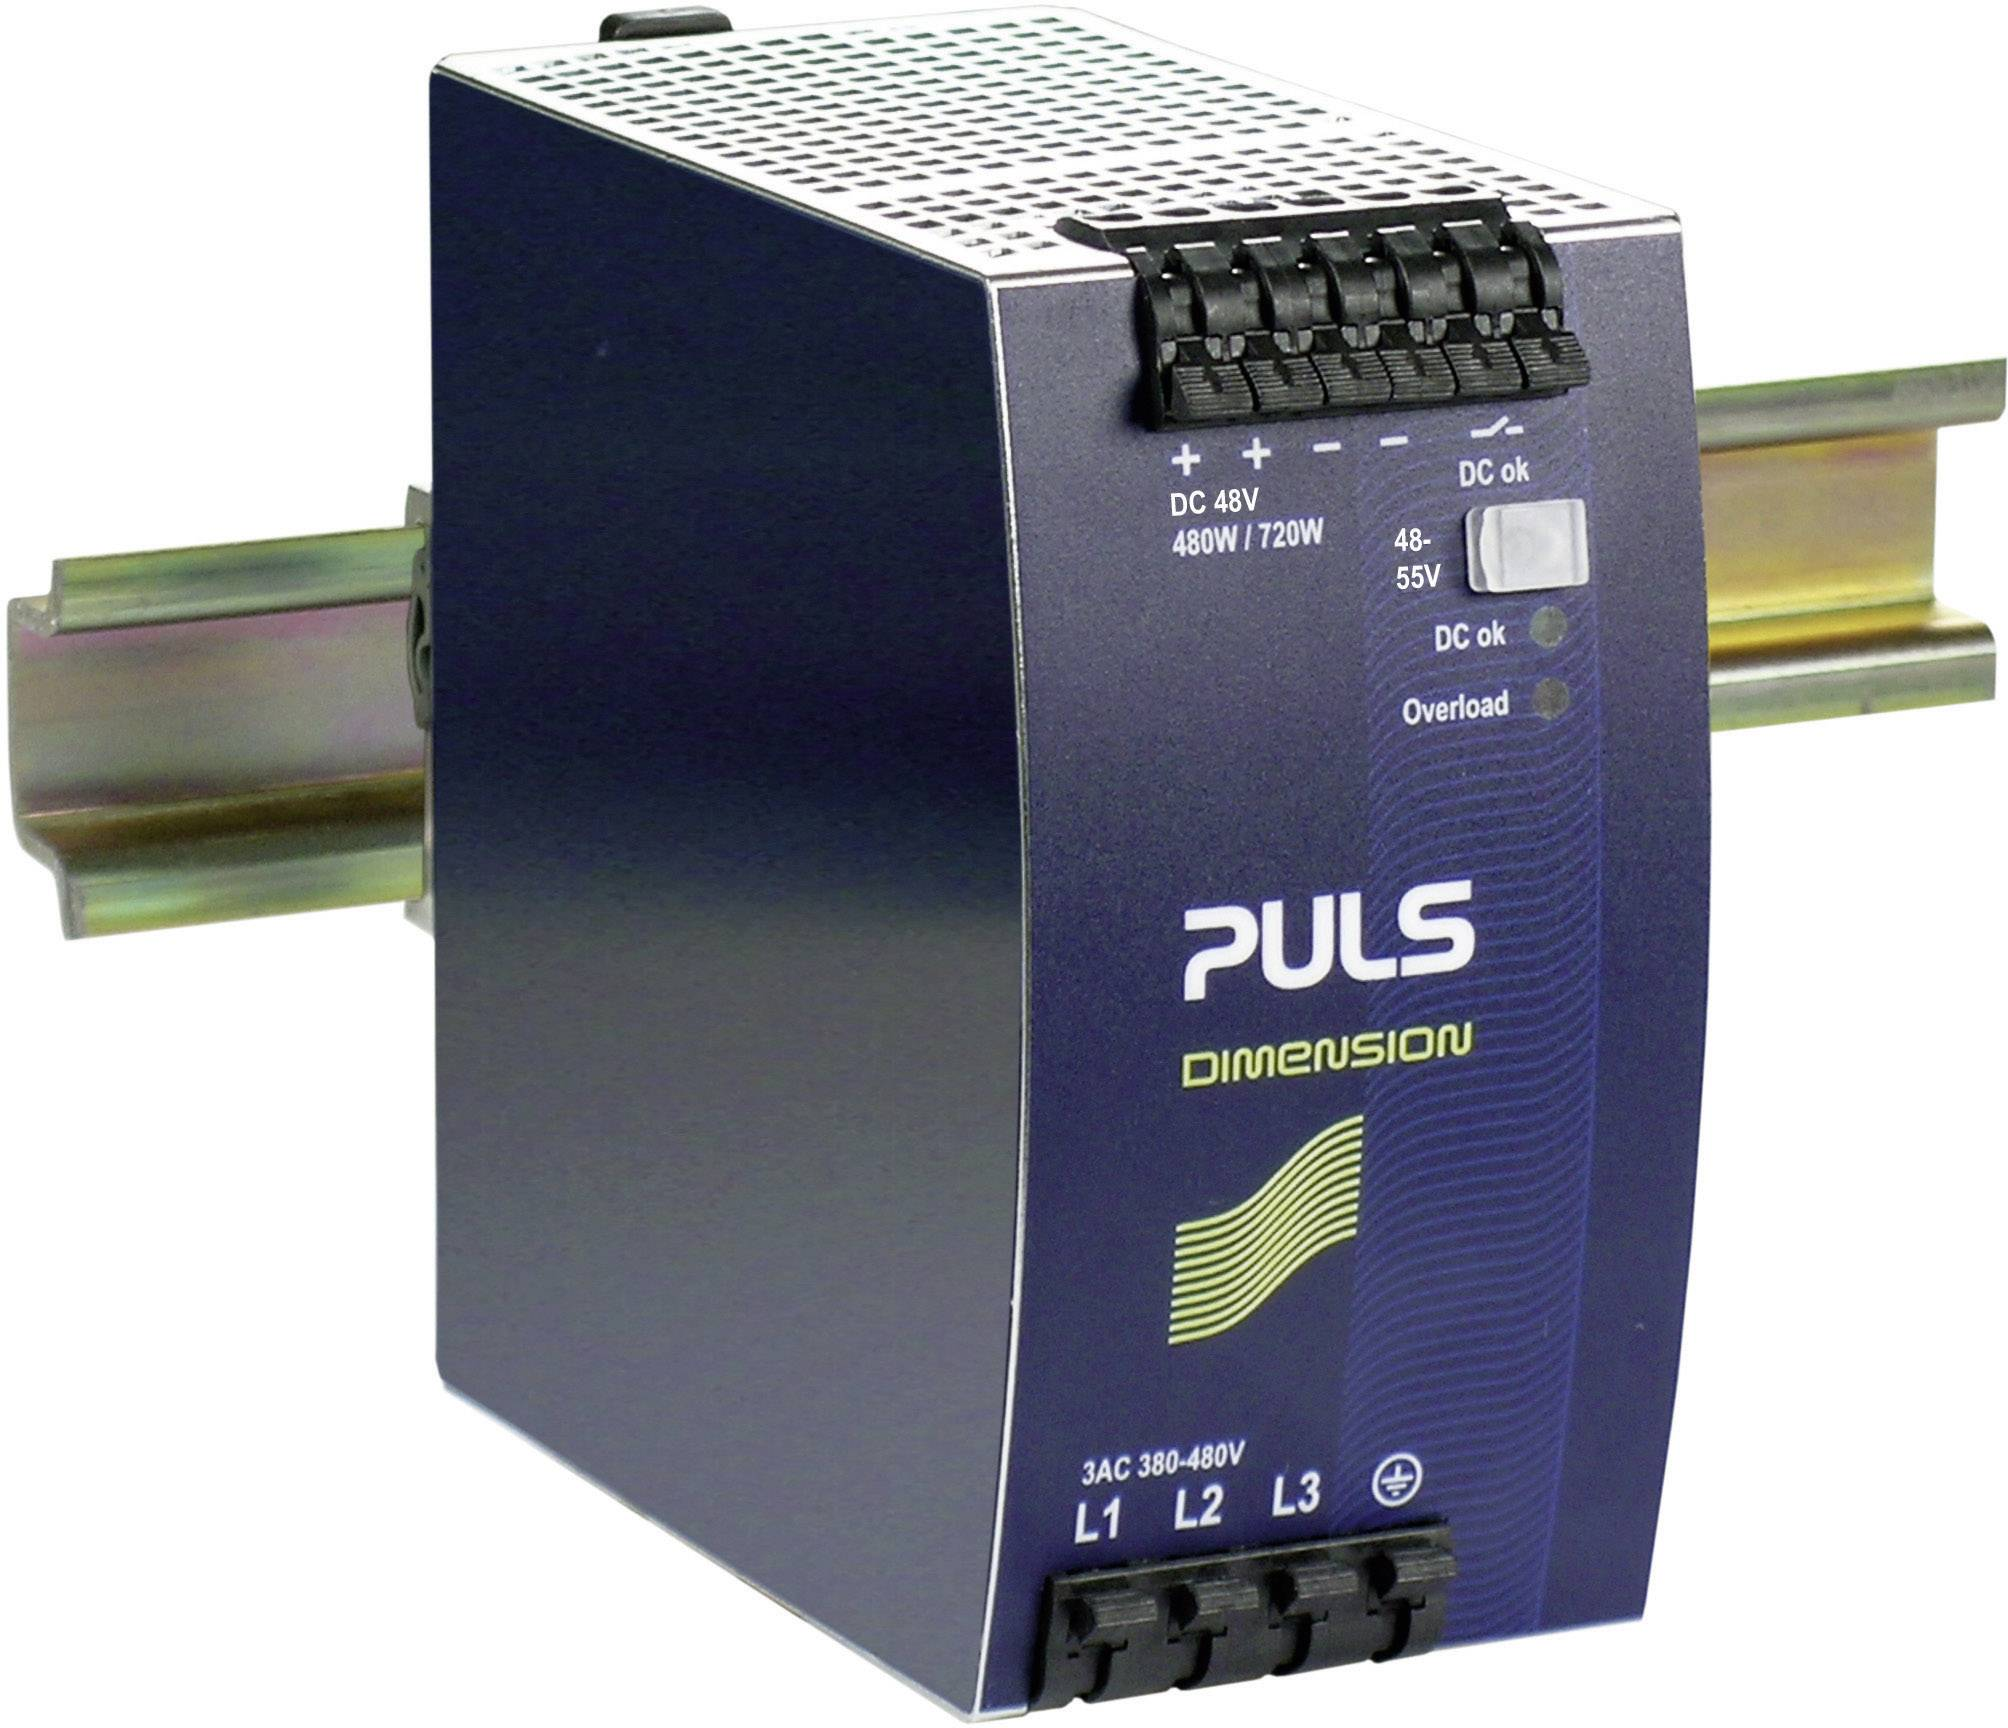 Sieťový zdroj na montážnu lištu (DIN lištu) PULS DIMENSION QT20.481, 1 x, 48 V/DC, 10 A, 480 W